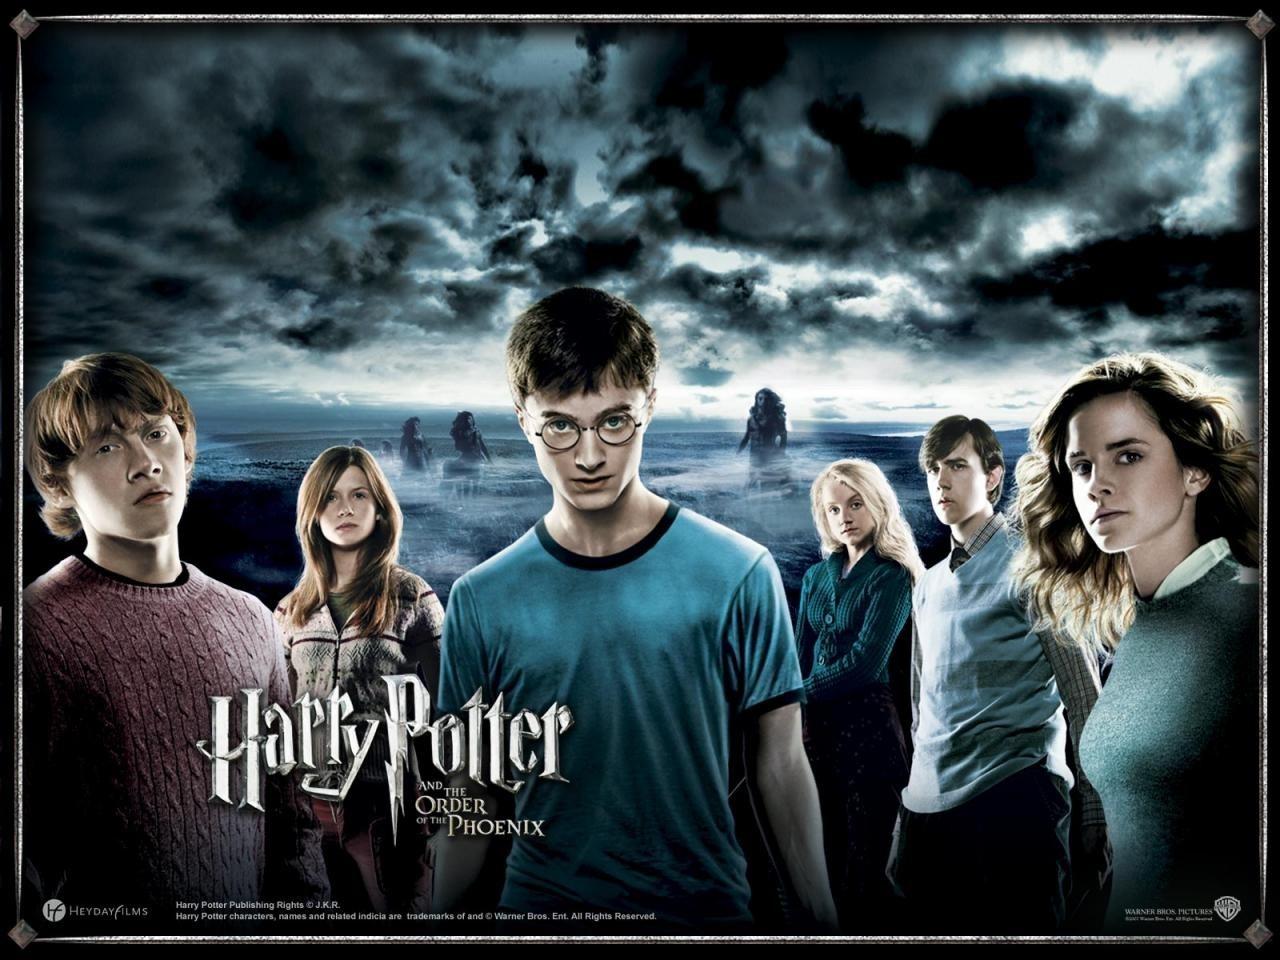 Ringkasan Cerita Harry Potter And The Deathly Hallows Bonie Soft Cover Dan Relikui Kematian Jk Rowling Phoels Blog